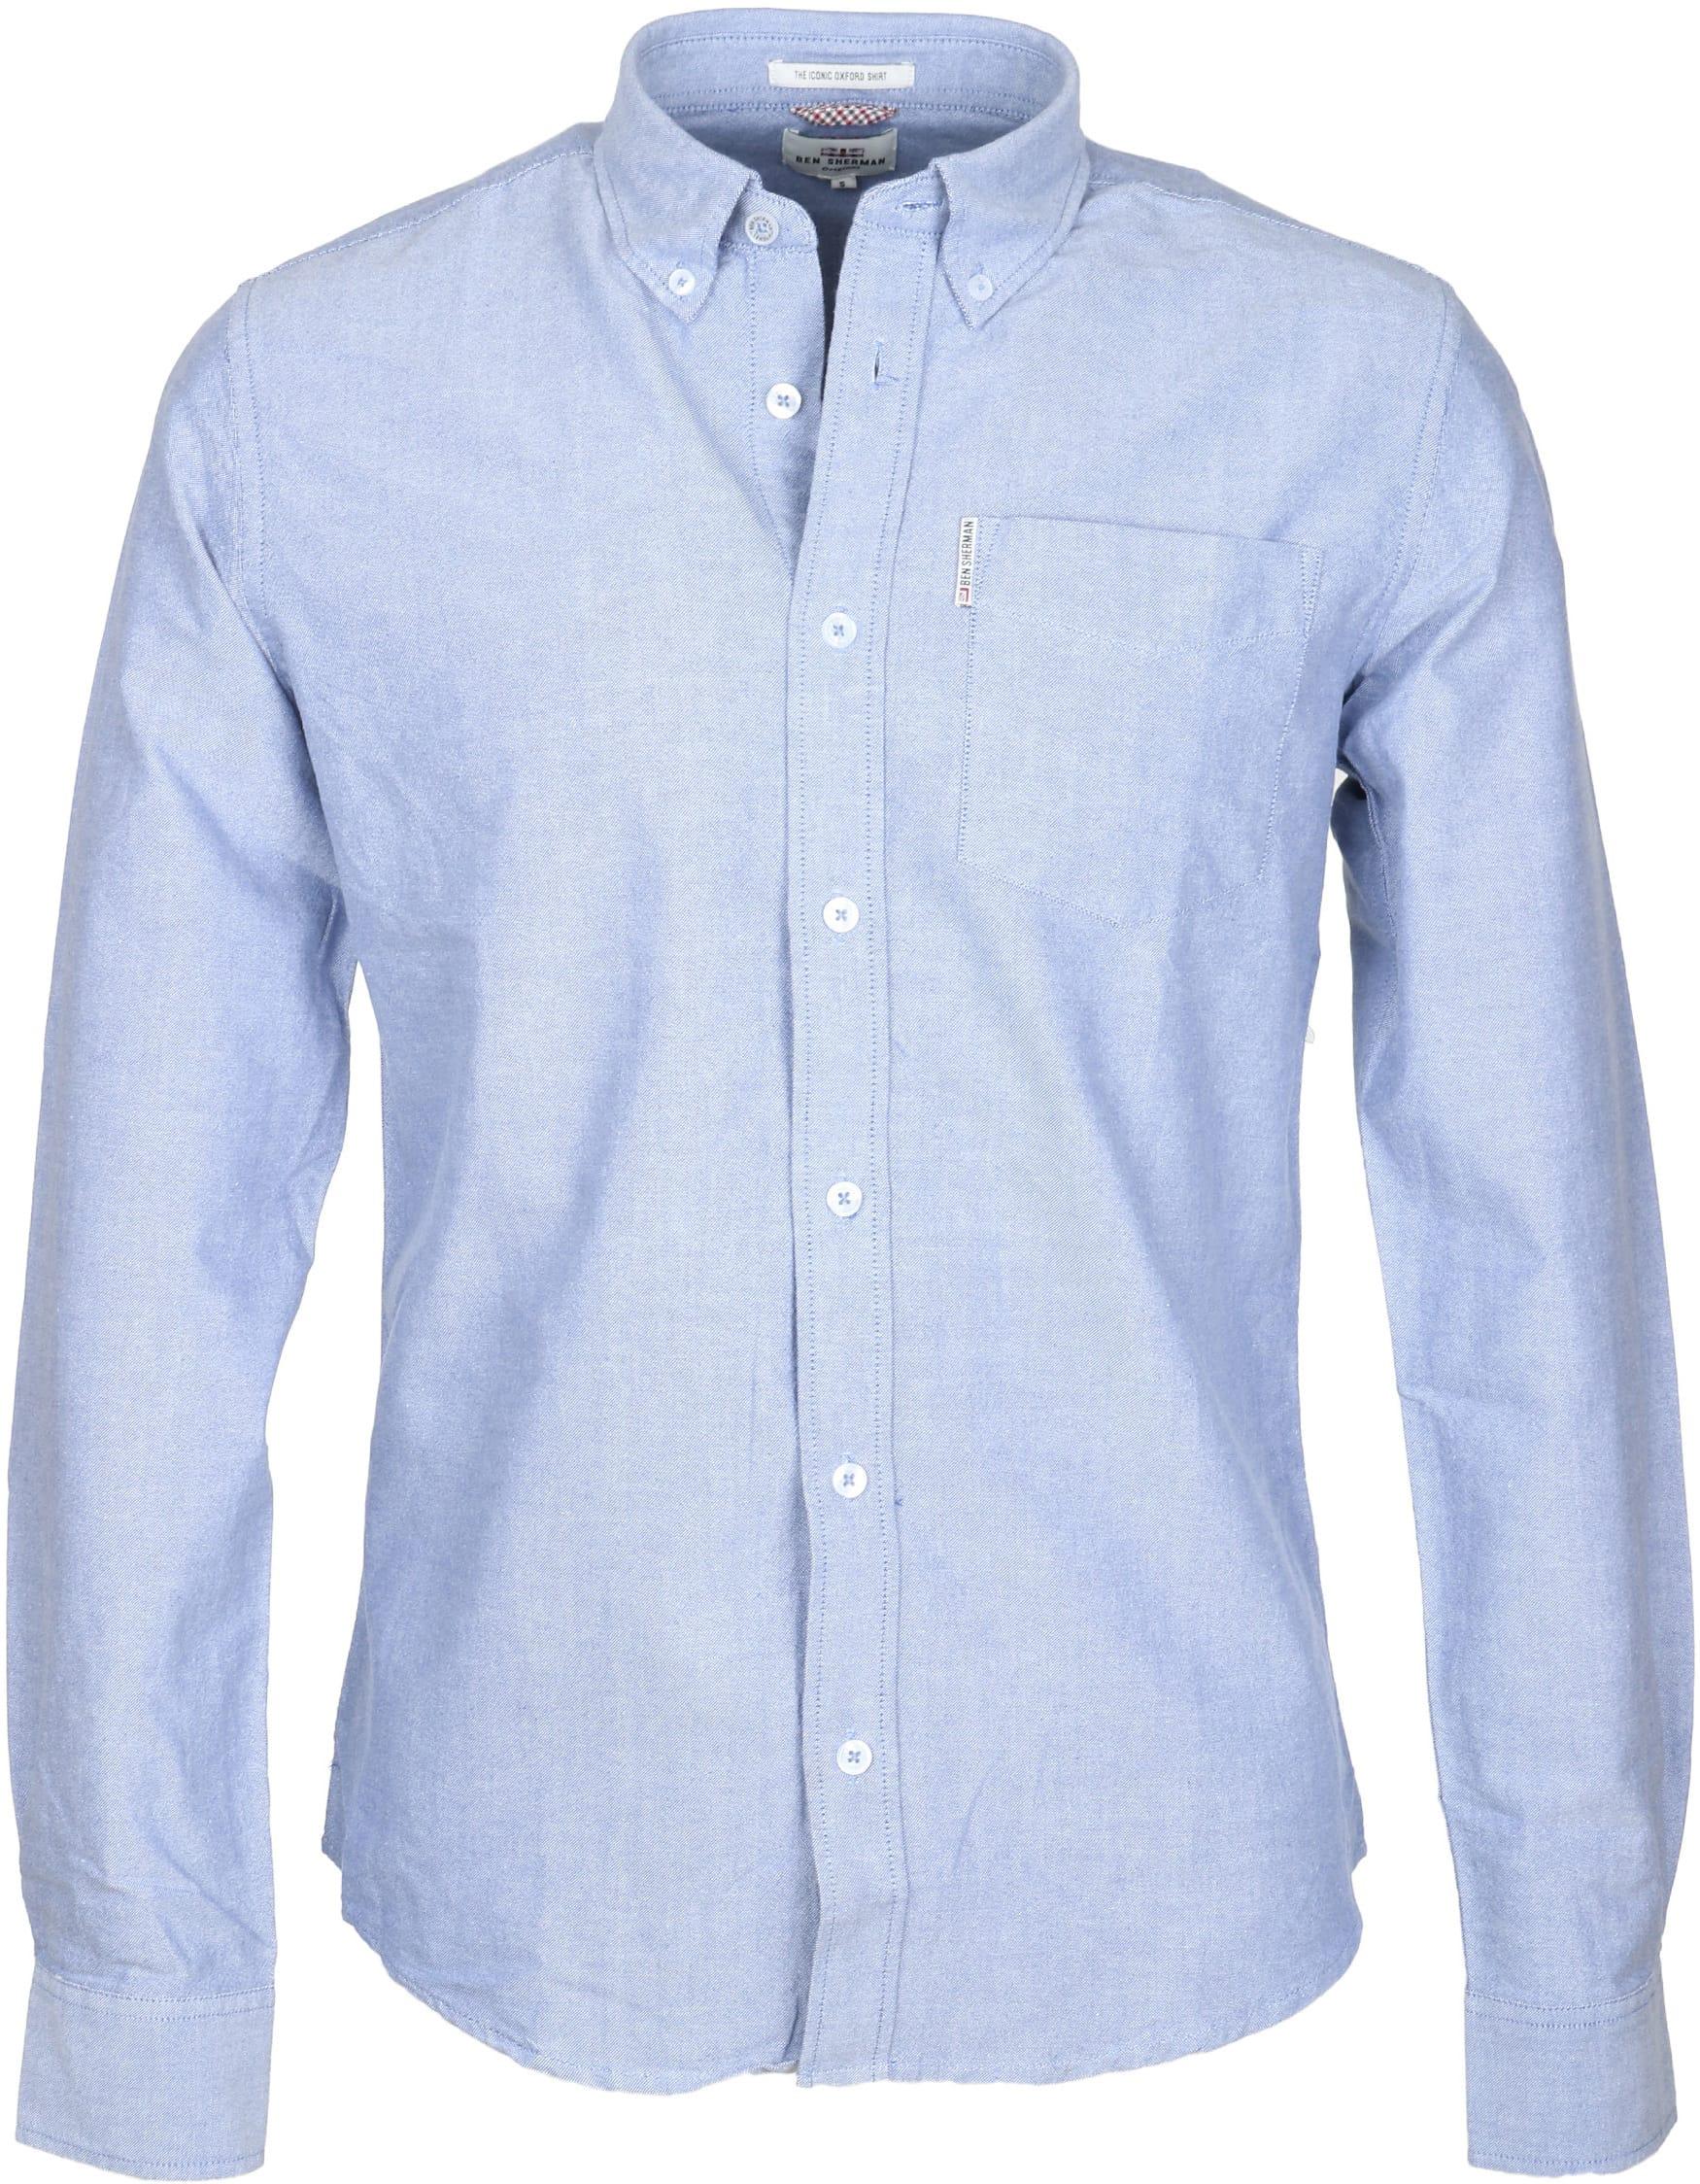 Ben Sherman Overhemd Blauw Oxford foto 0